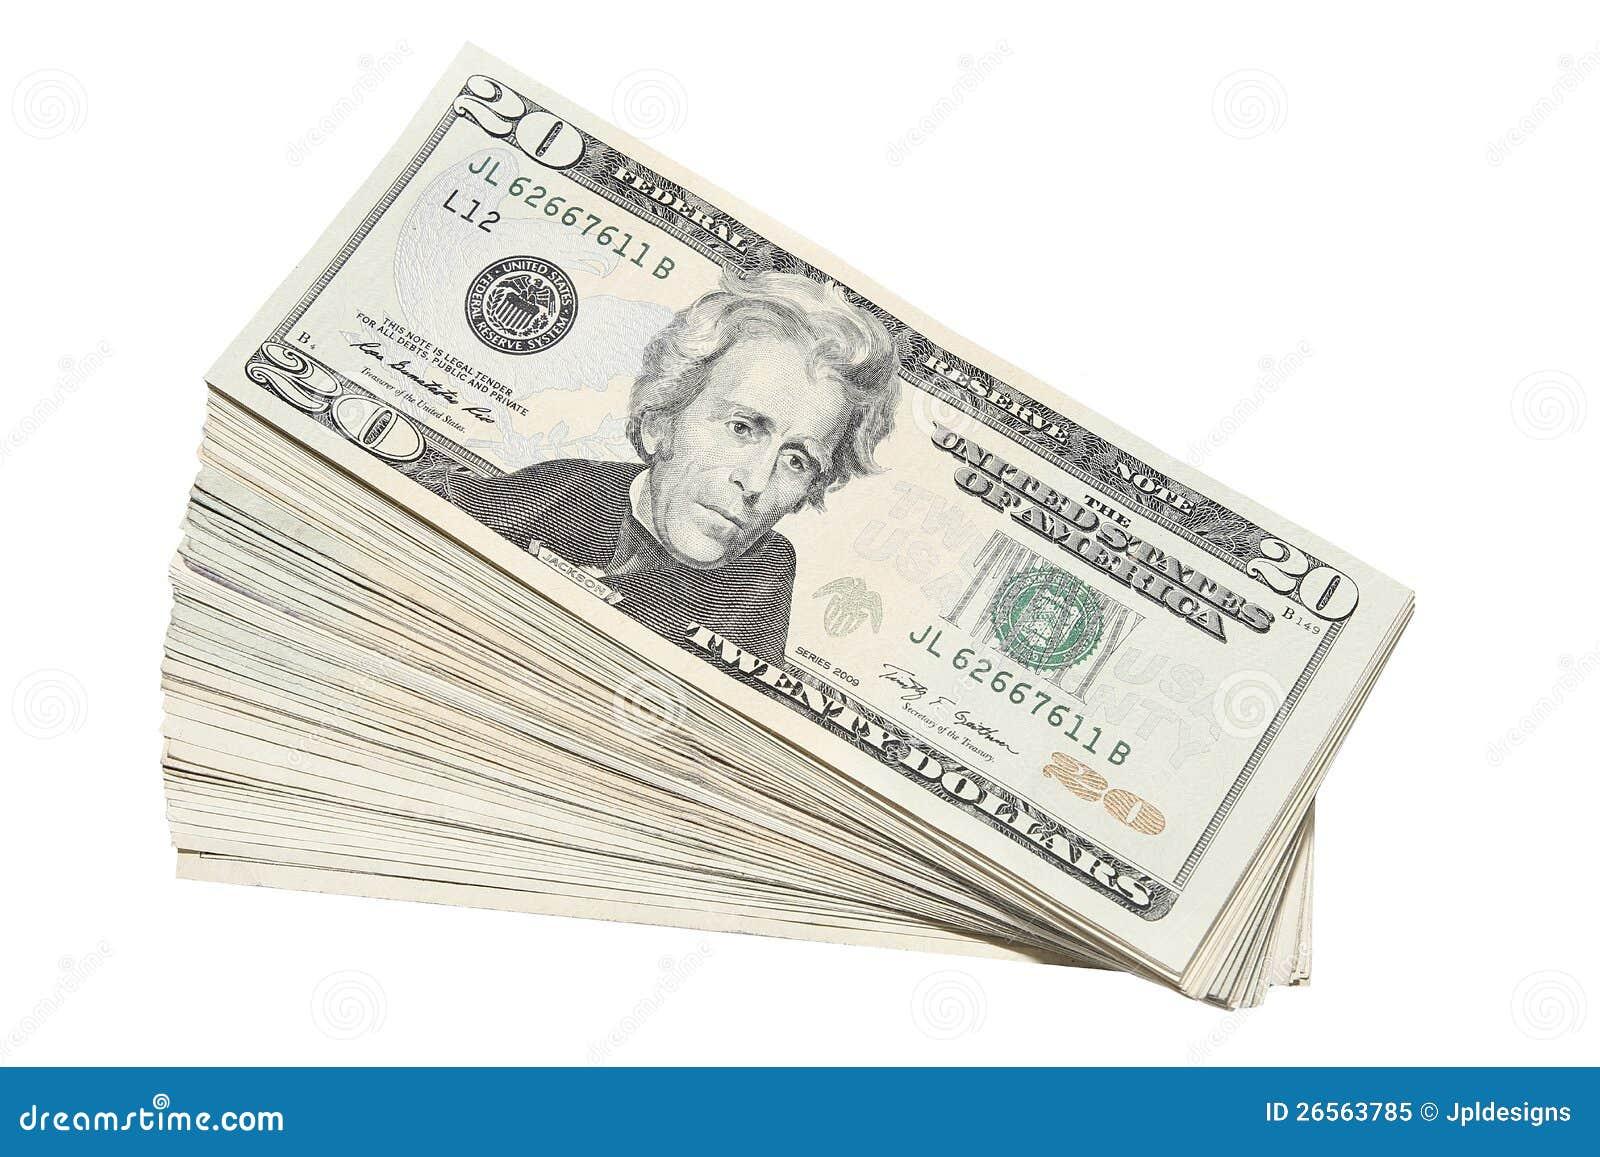 background with money us 20 dollar bills stock image image of